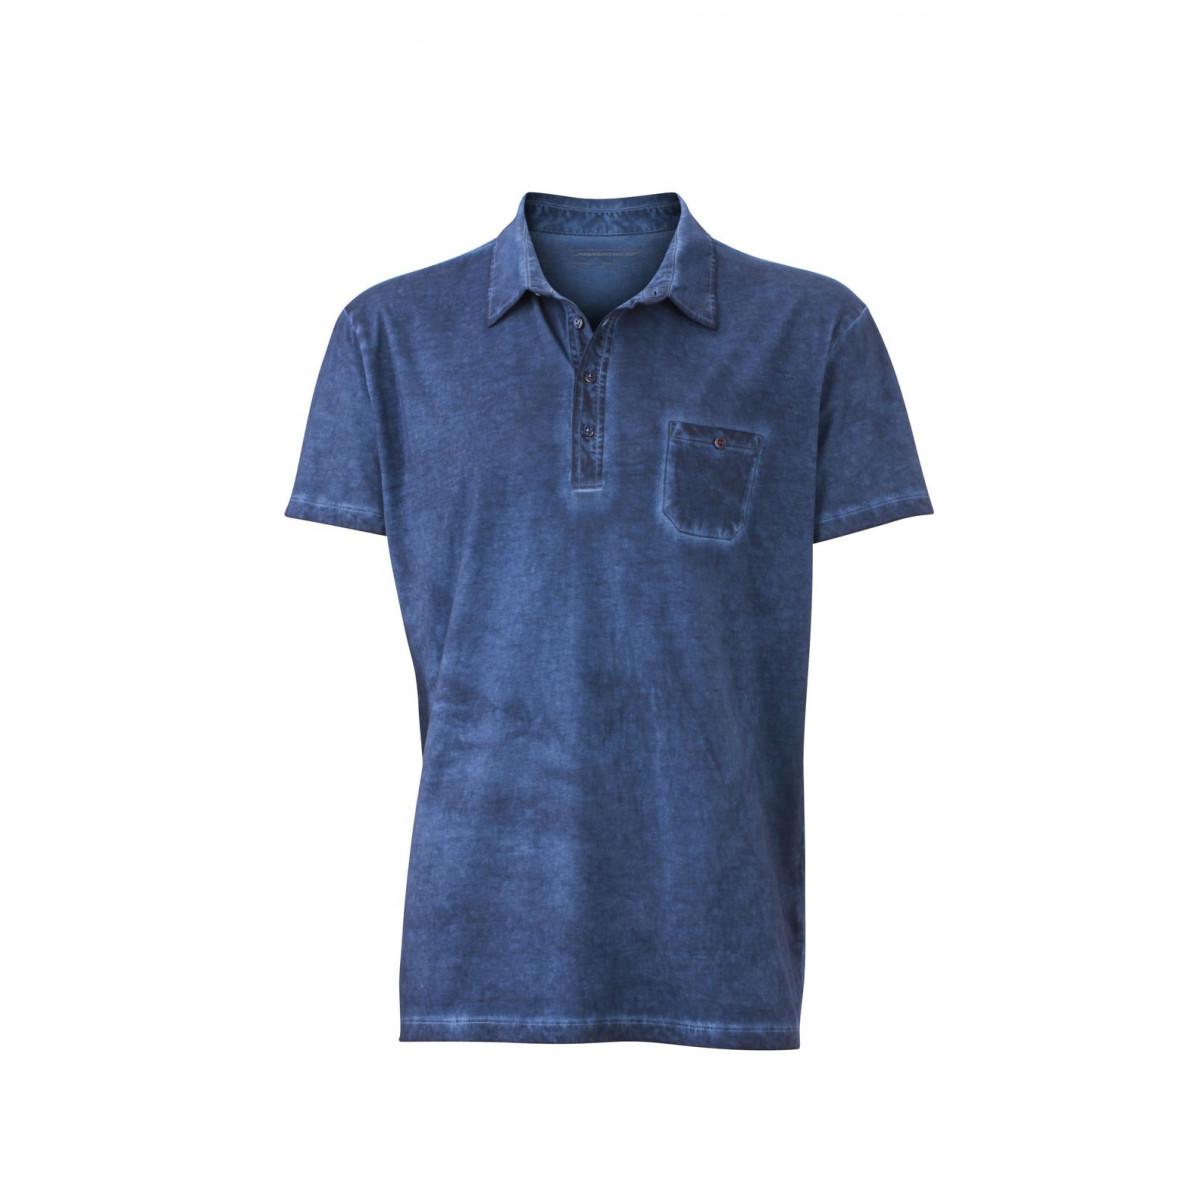 Рубашка поло мужская JN988 Mens Gipsy Polo - Джинс